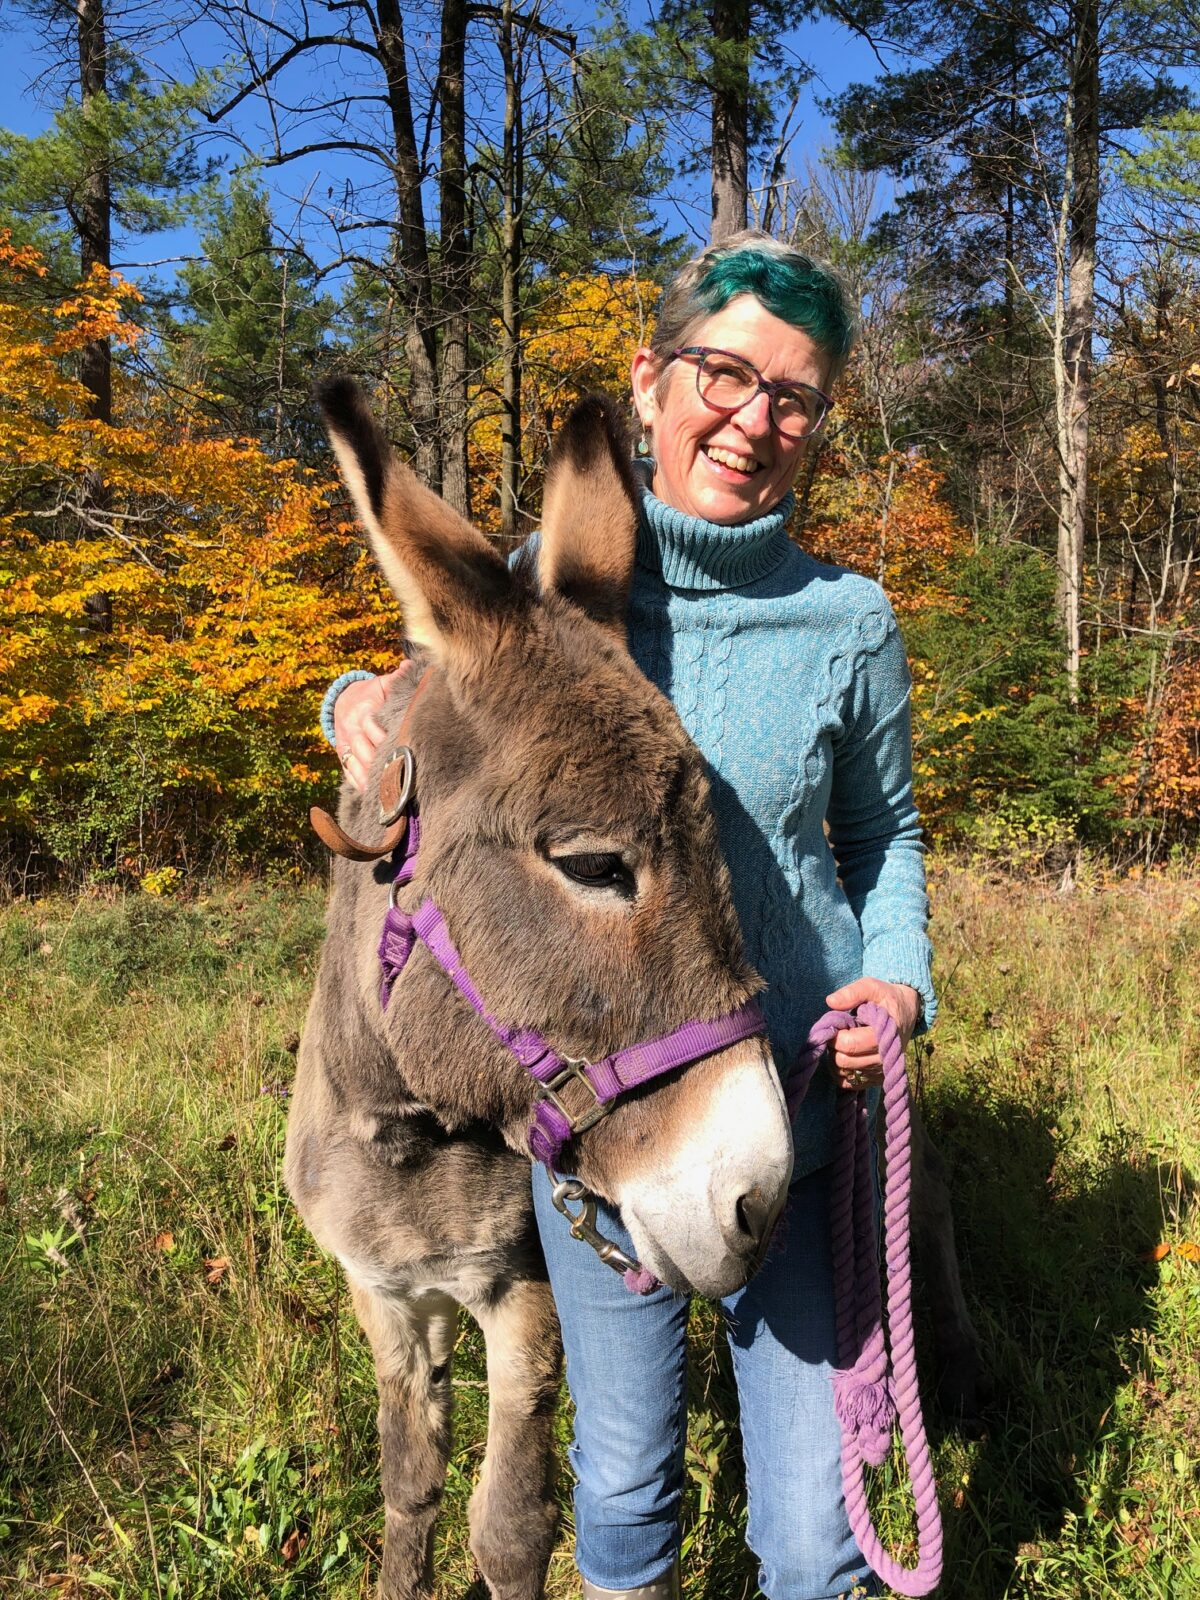 Lisa and one of her donkeys, Marsela